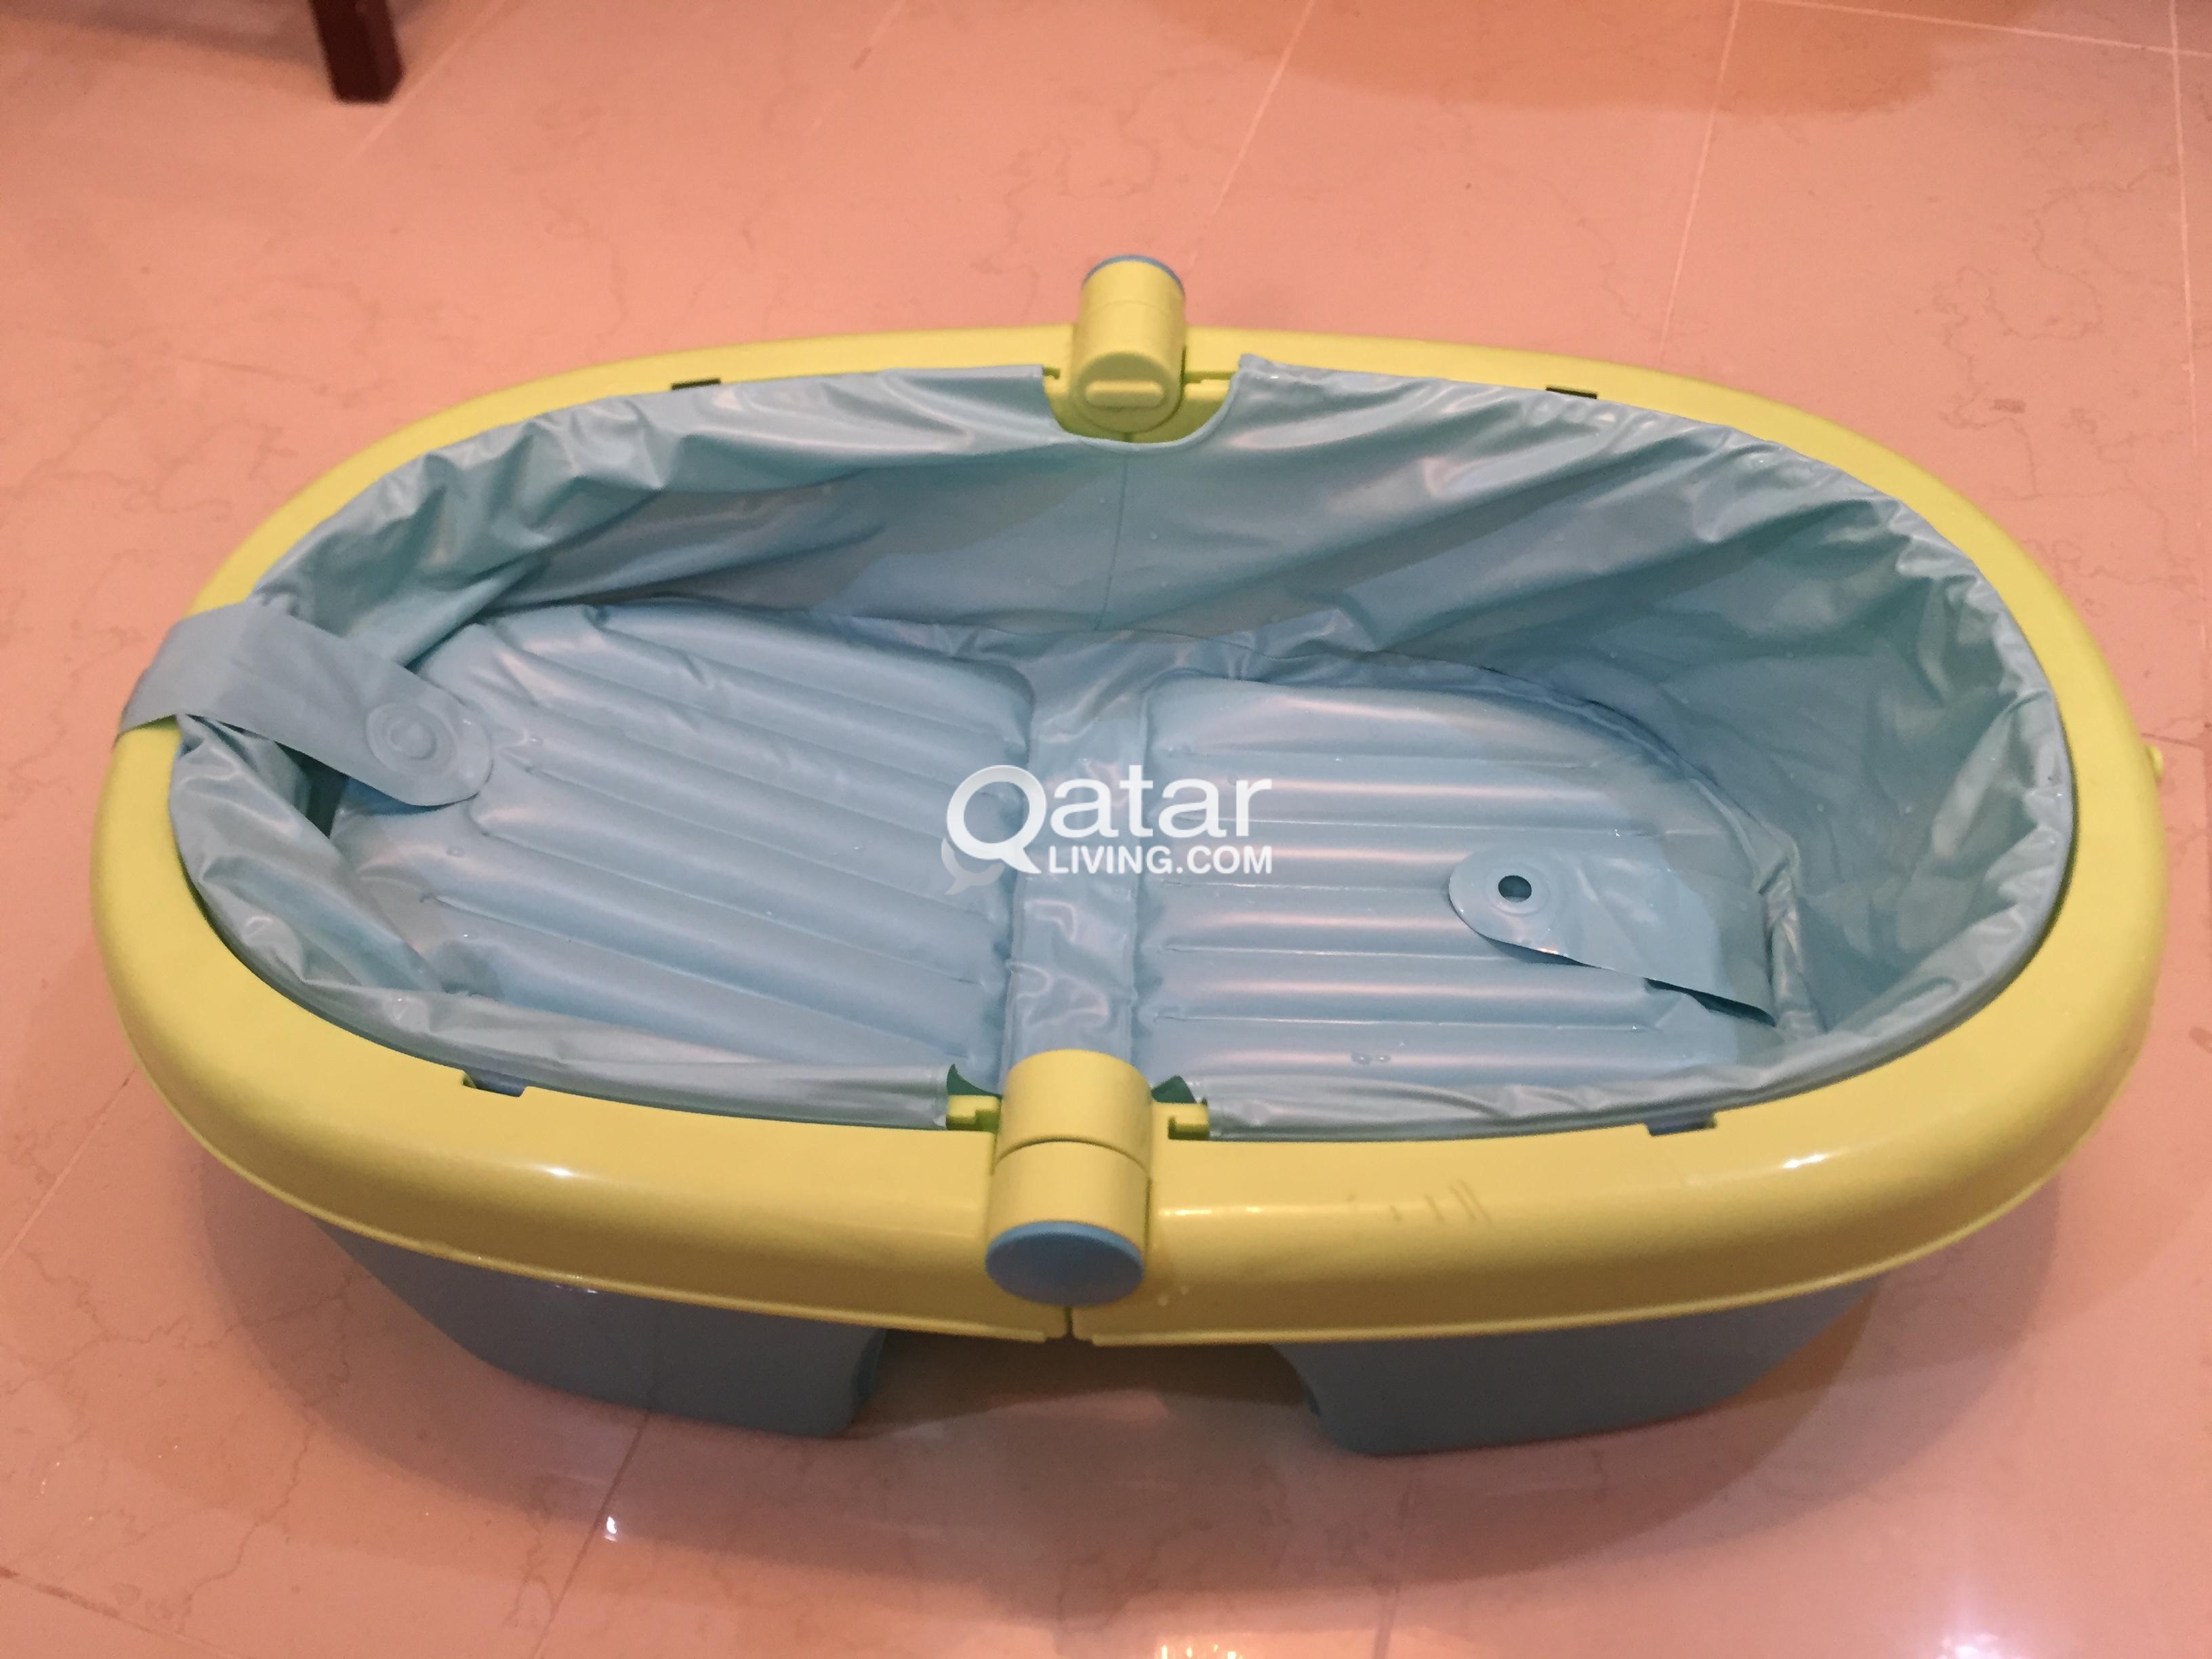 Comfortable Baby Bath Tub - with Air filled Tubes | Qatar Living